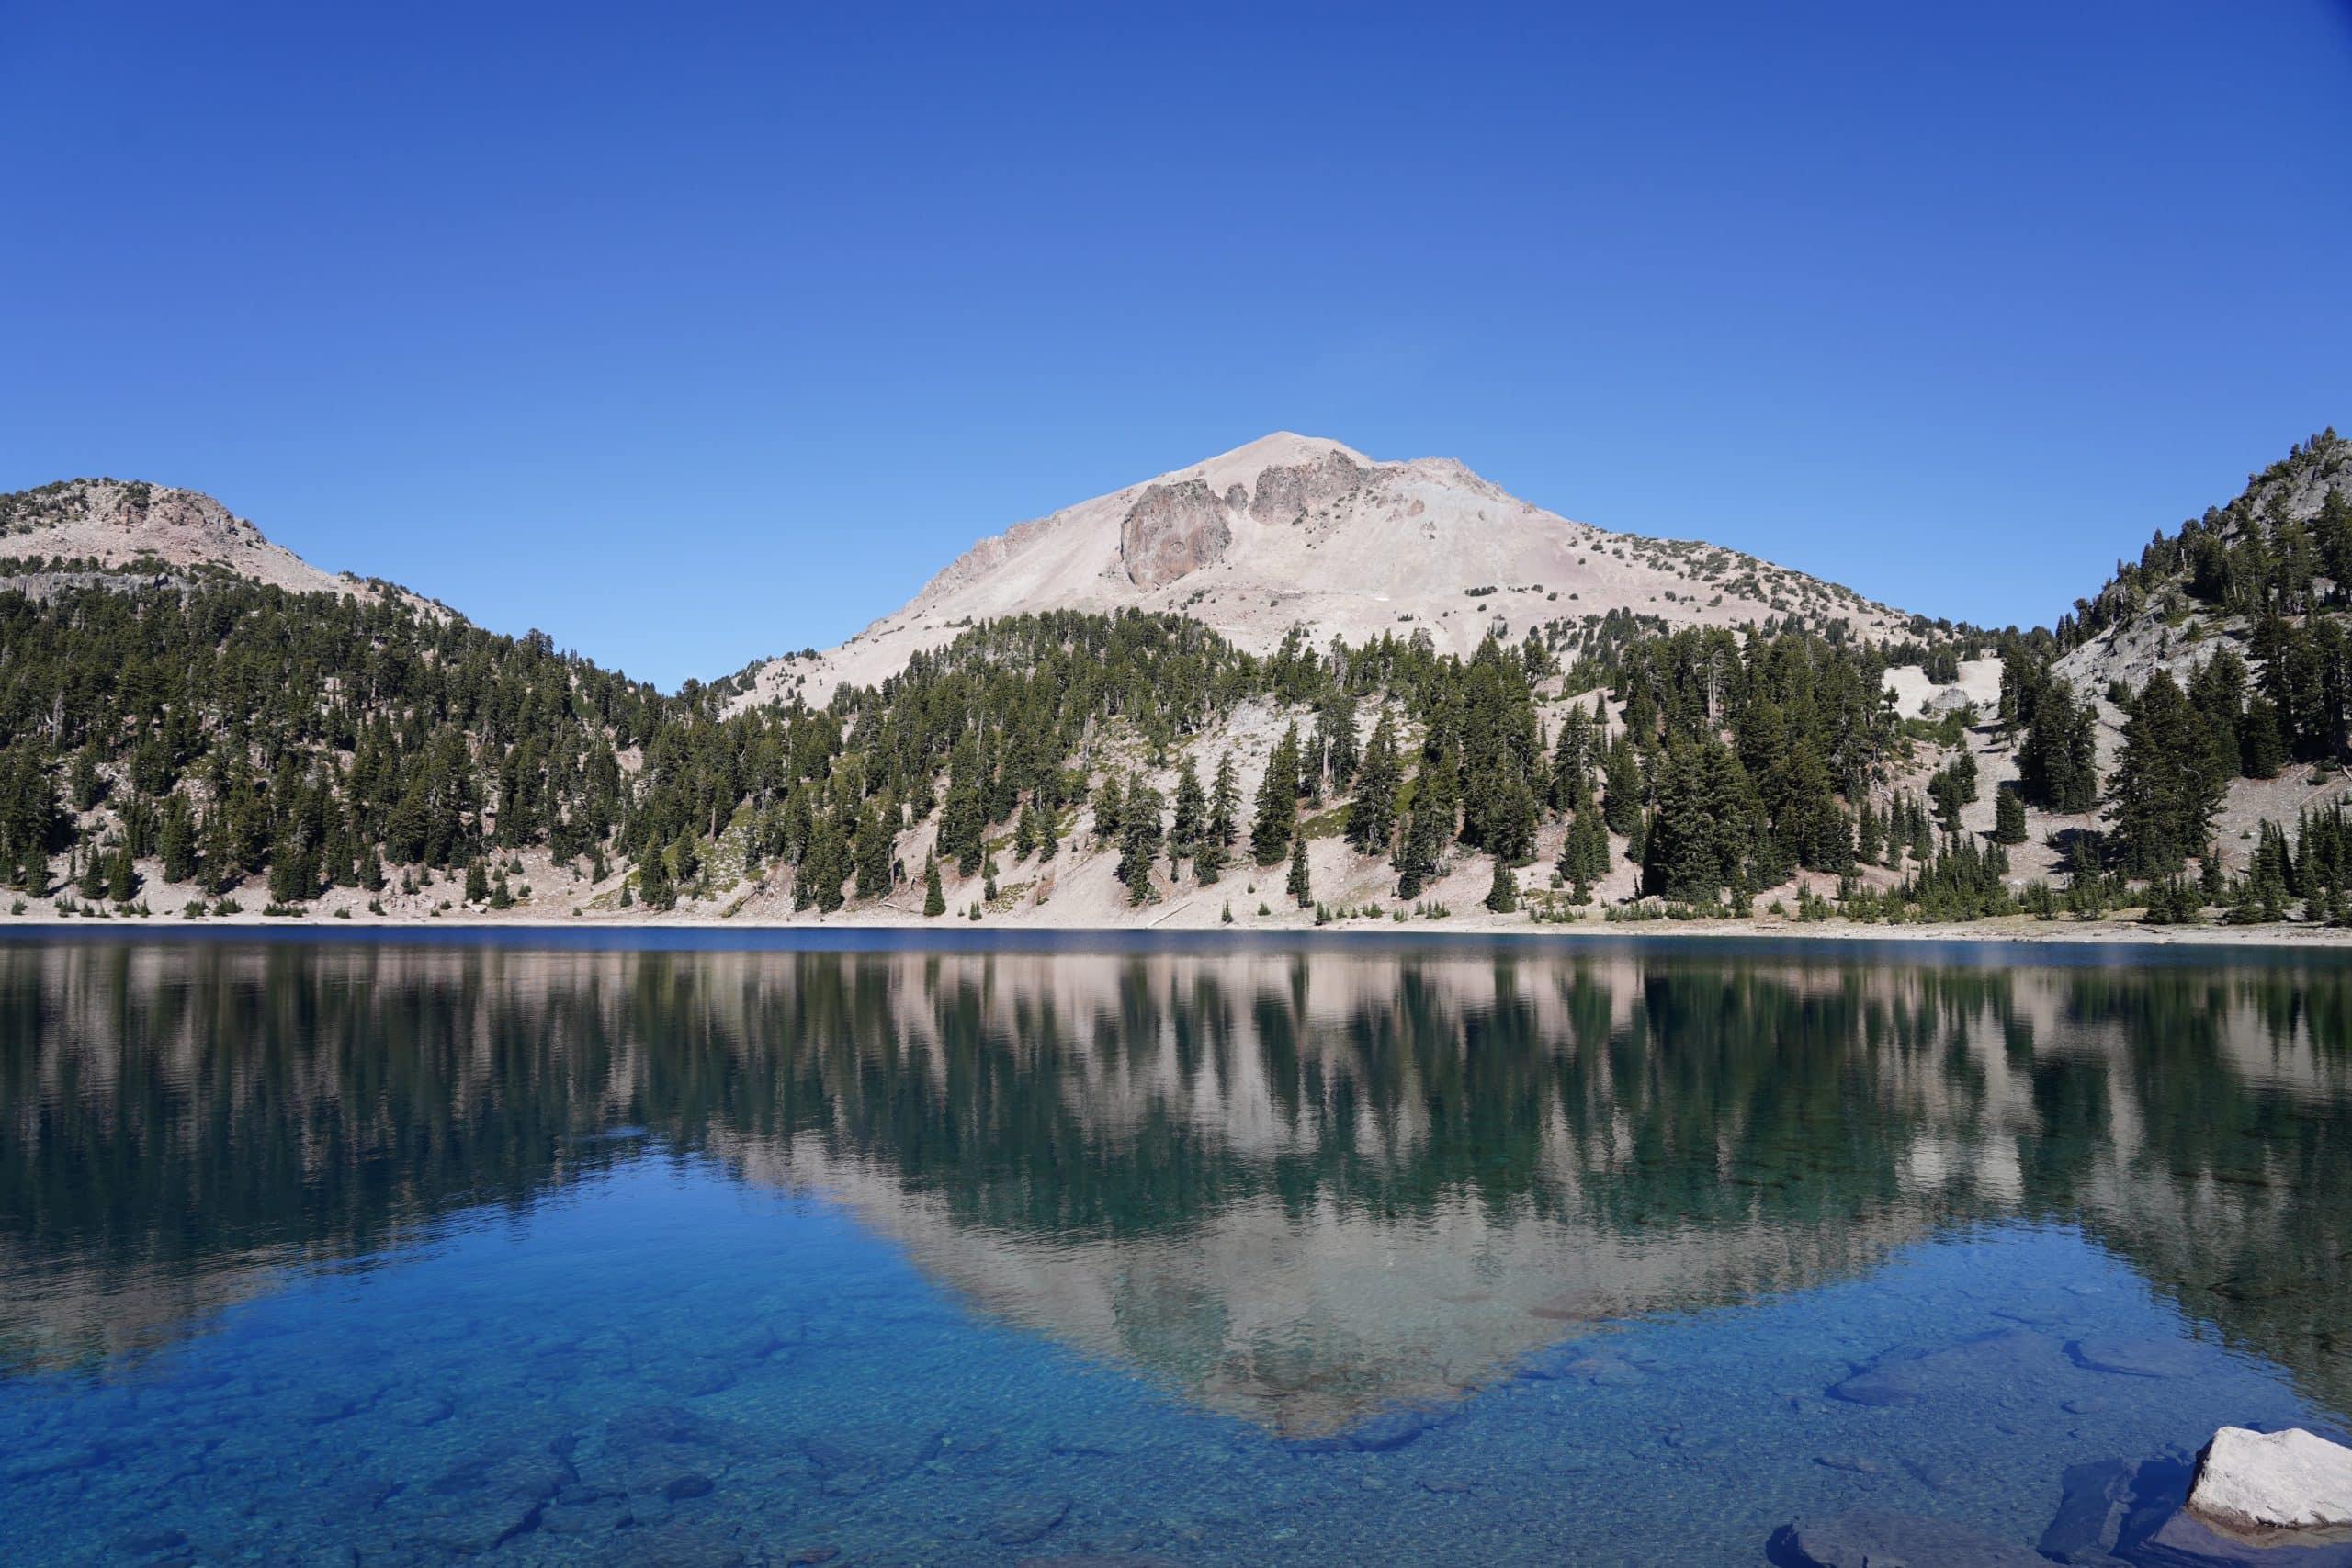 Lassen National Park in California.